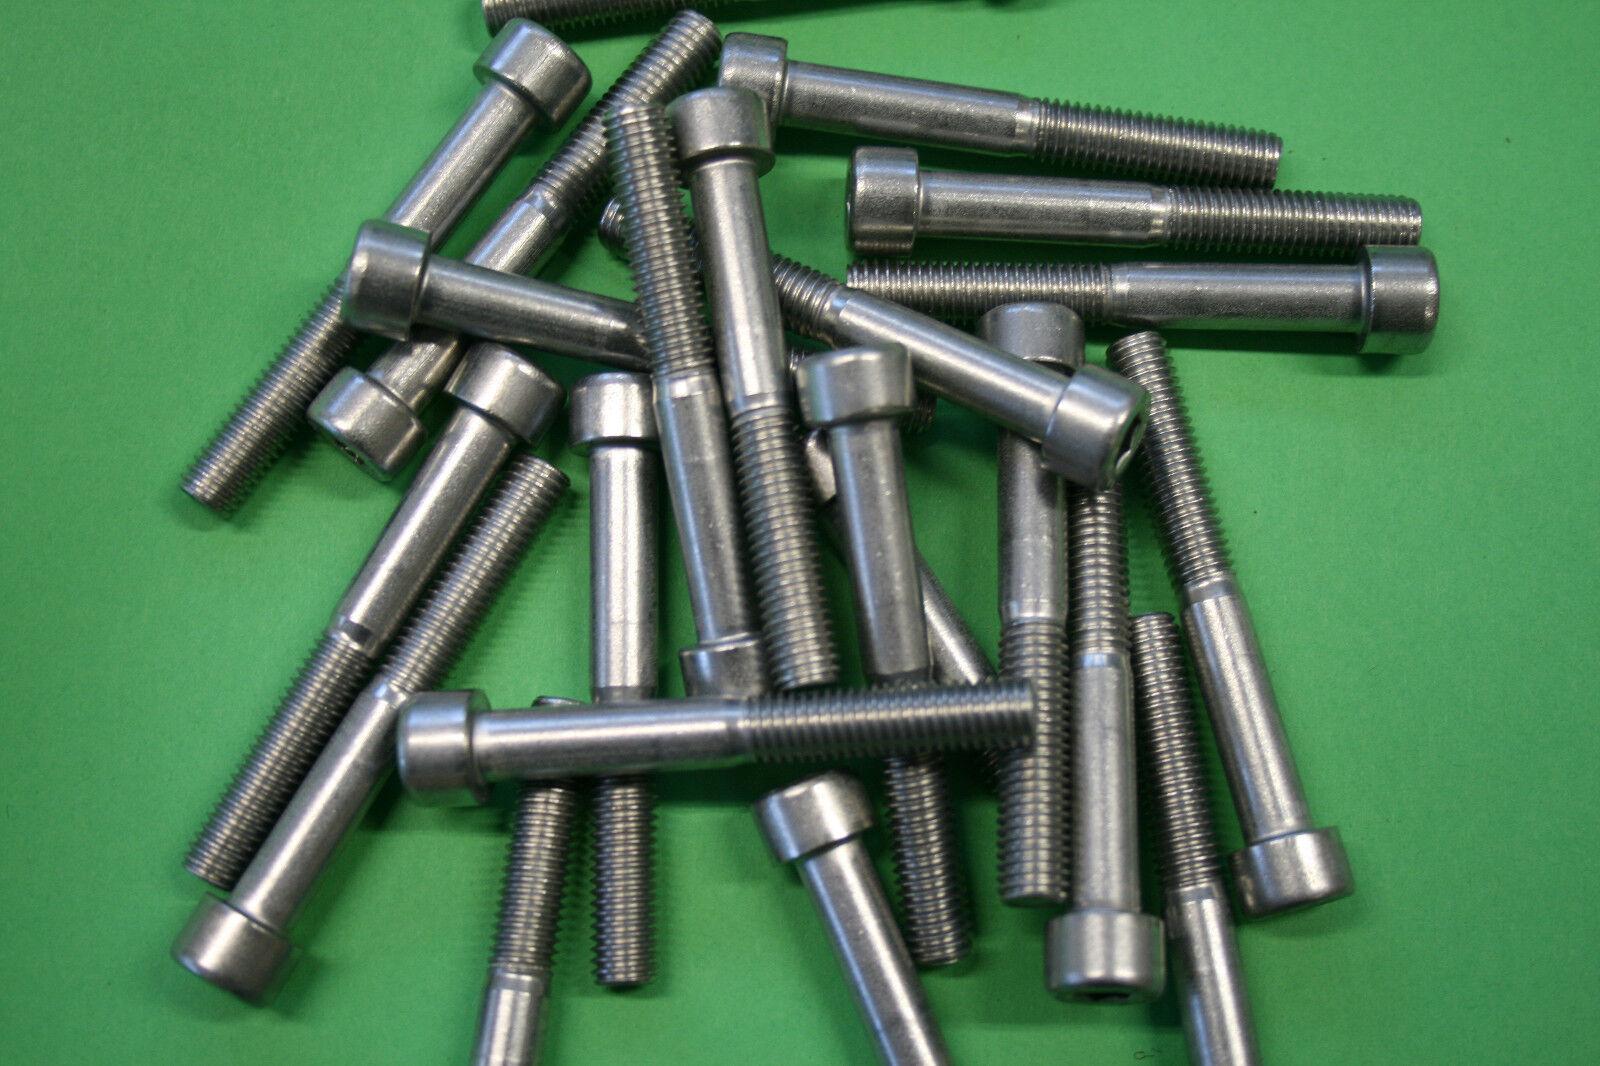 Gewindeschraube, Zylinderschrauben, M6 ,10-100mm, DIN 912 ,Edelstahl A2 V2A